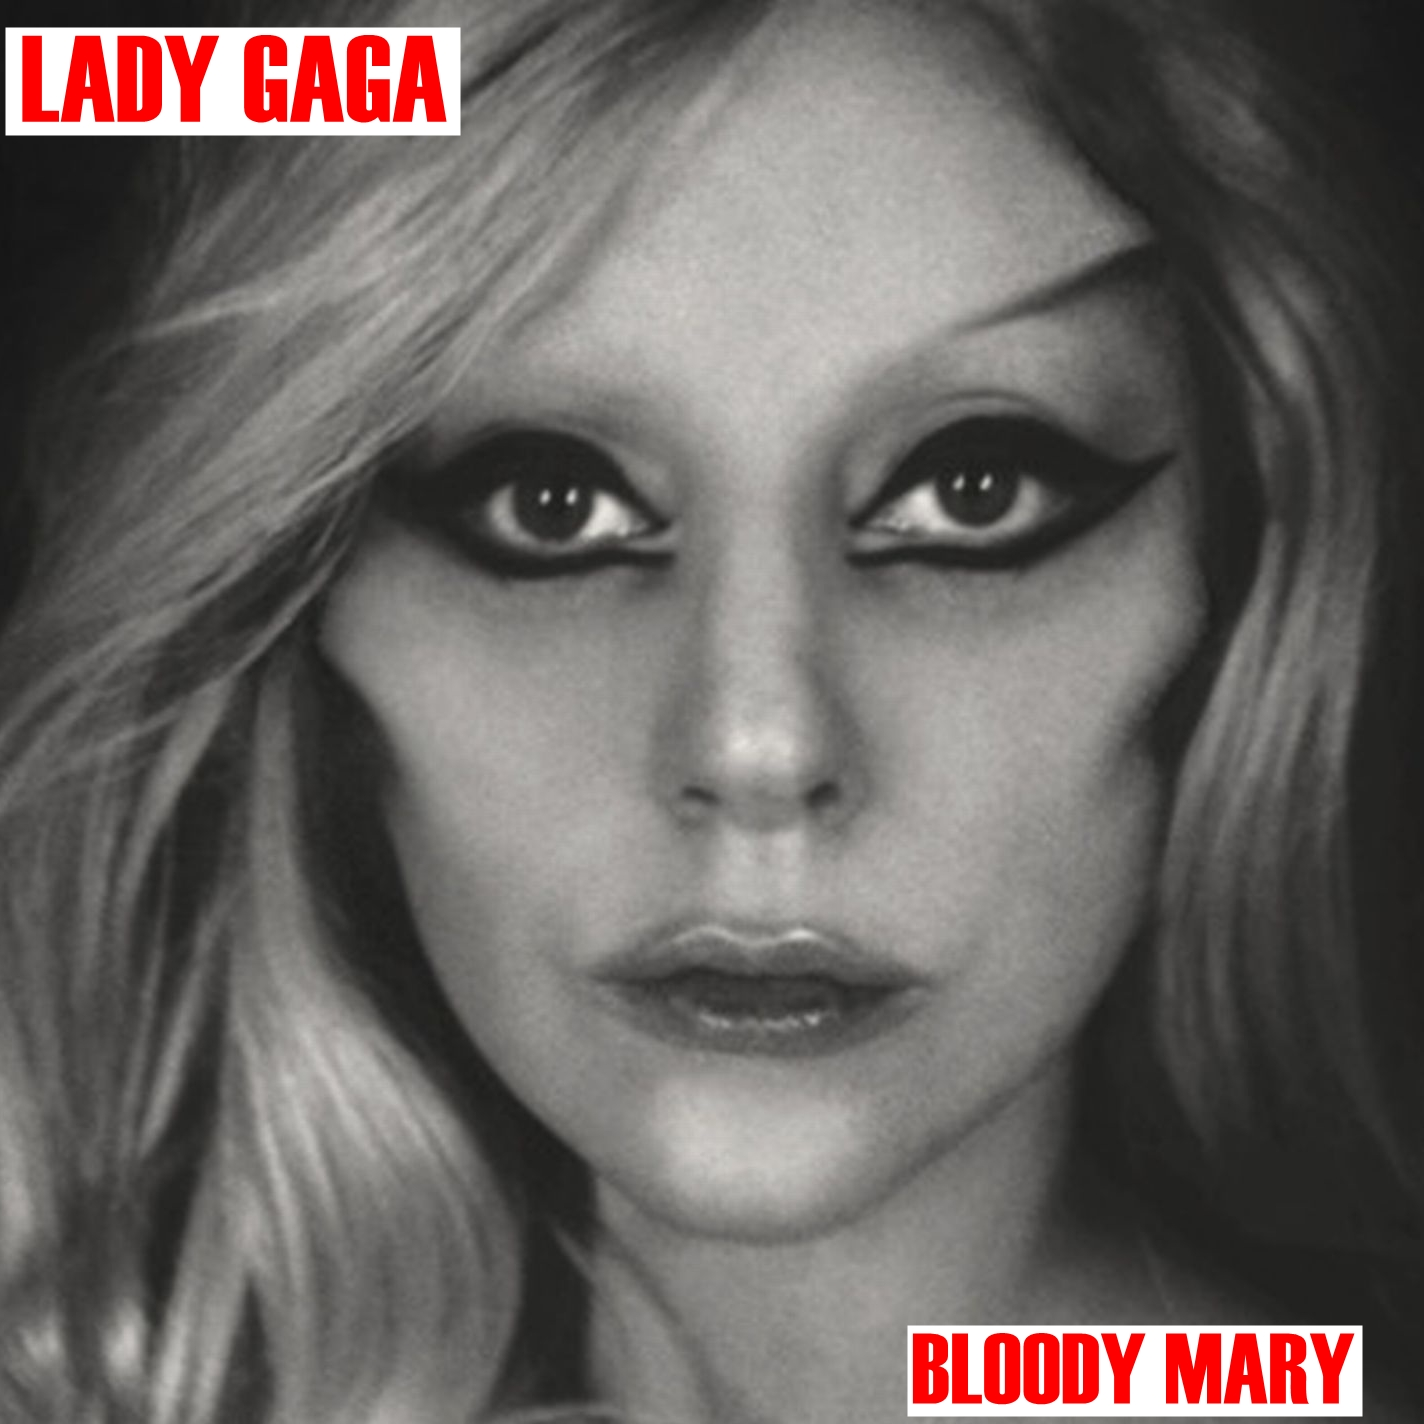 http://3.bp.blogspot.com/-thV2sZjQ2AM/Tc1vMtItNoI/AAAAAAAABDk/224yNFAH4Xc/s1600/BTW-Bloody.Mary.jpg